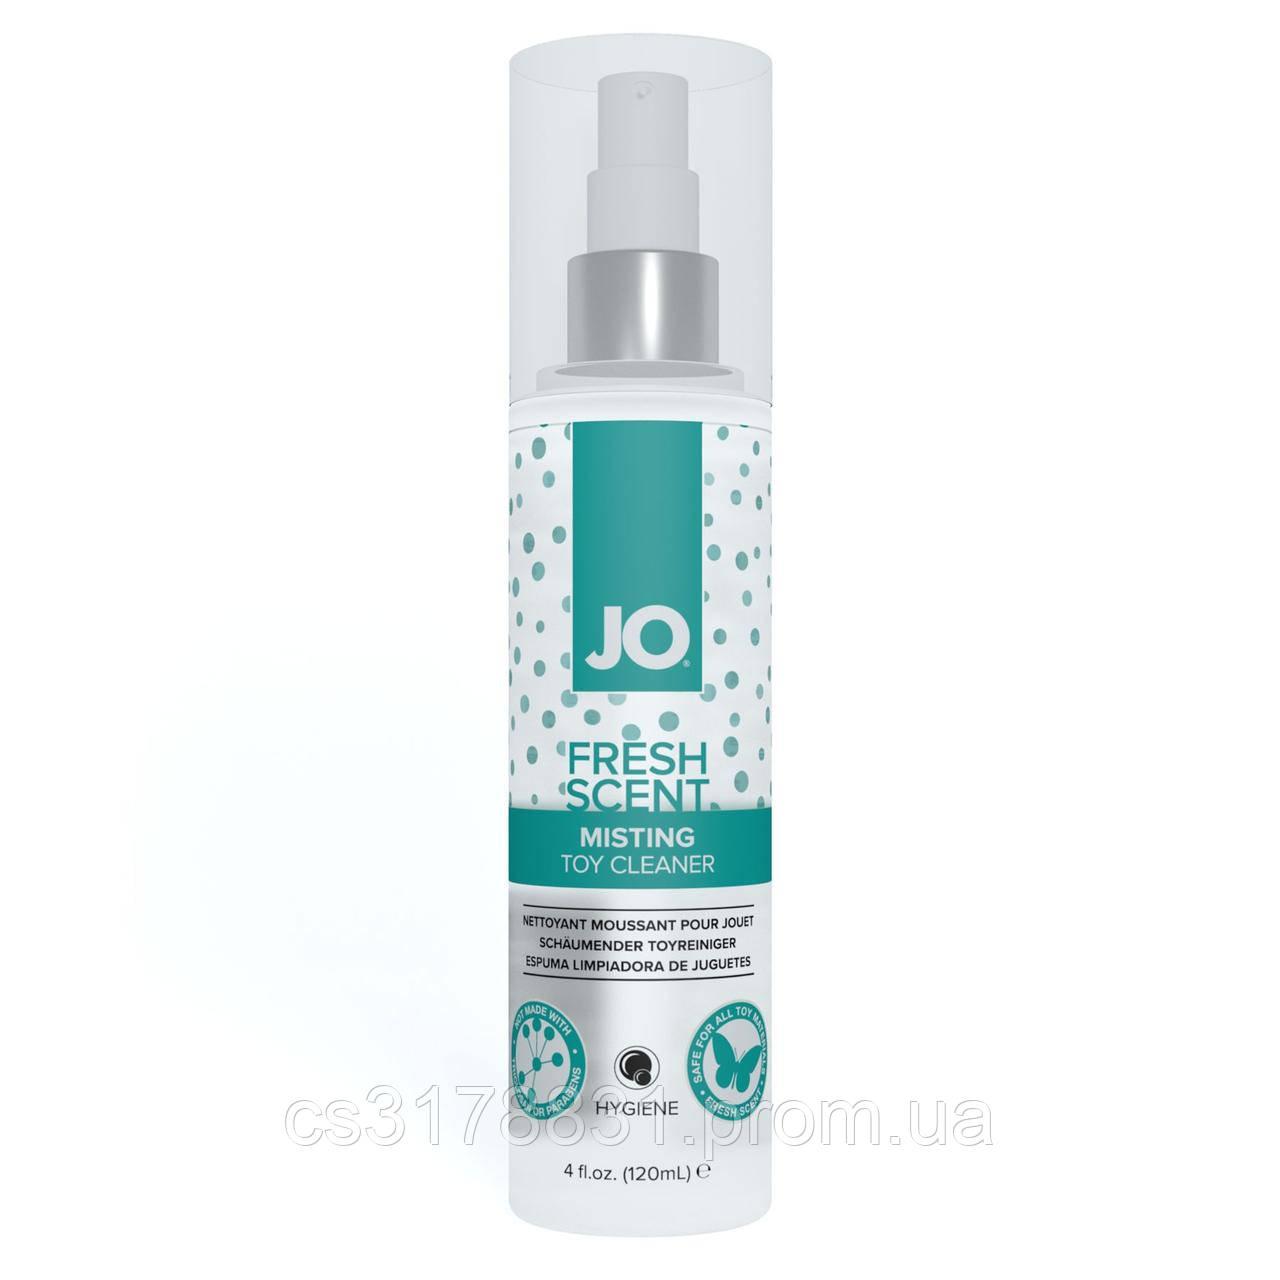 Чистящее средство System JO Fresh Scent Misting Toy Cleaner (120 мл)